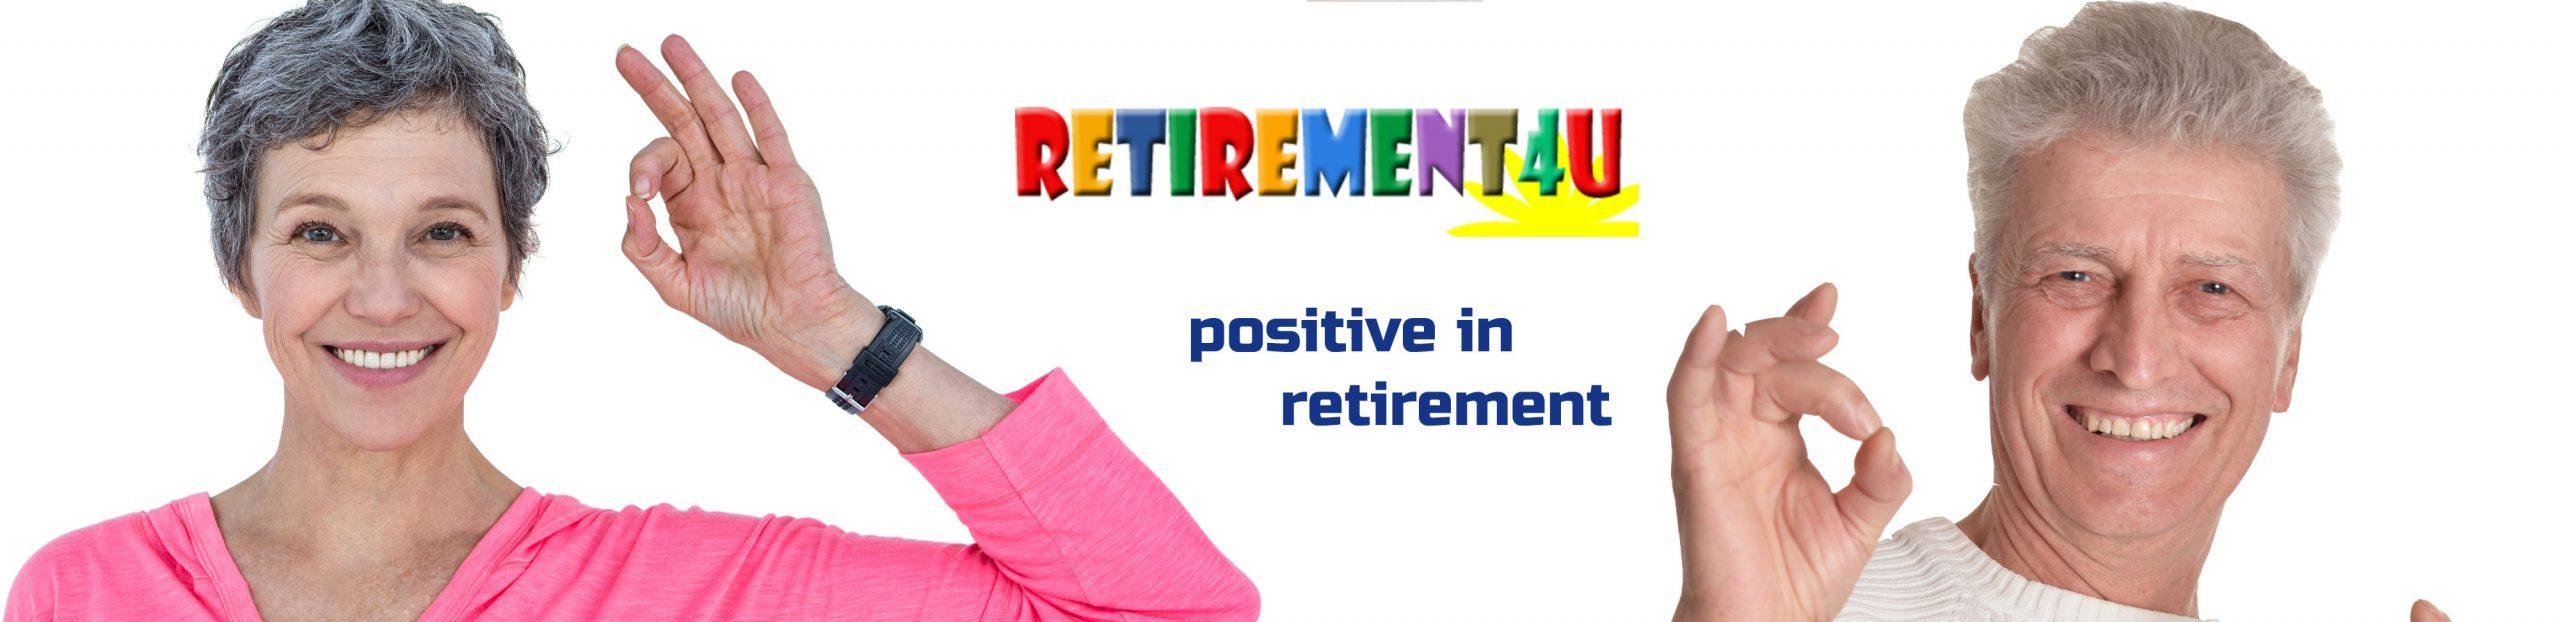 retirement - be positive